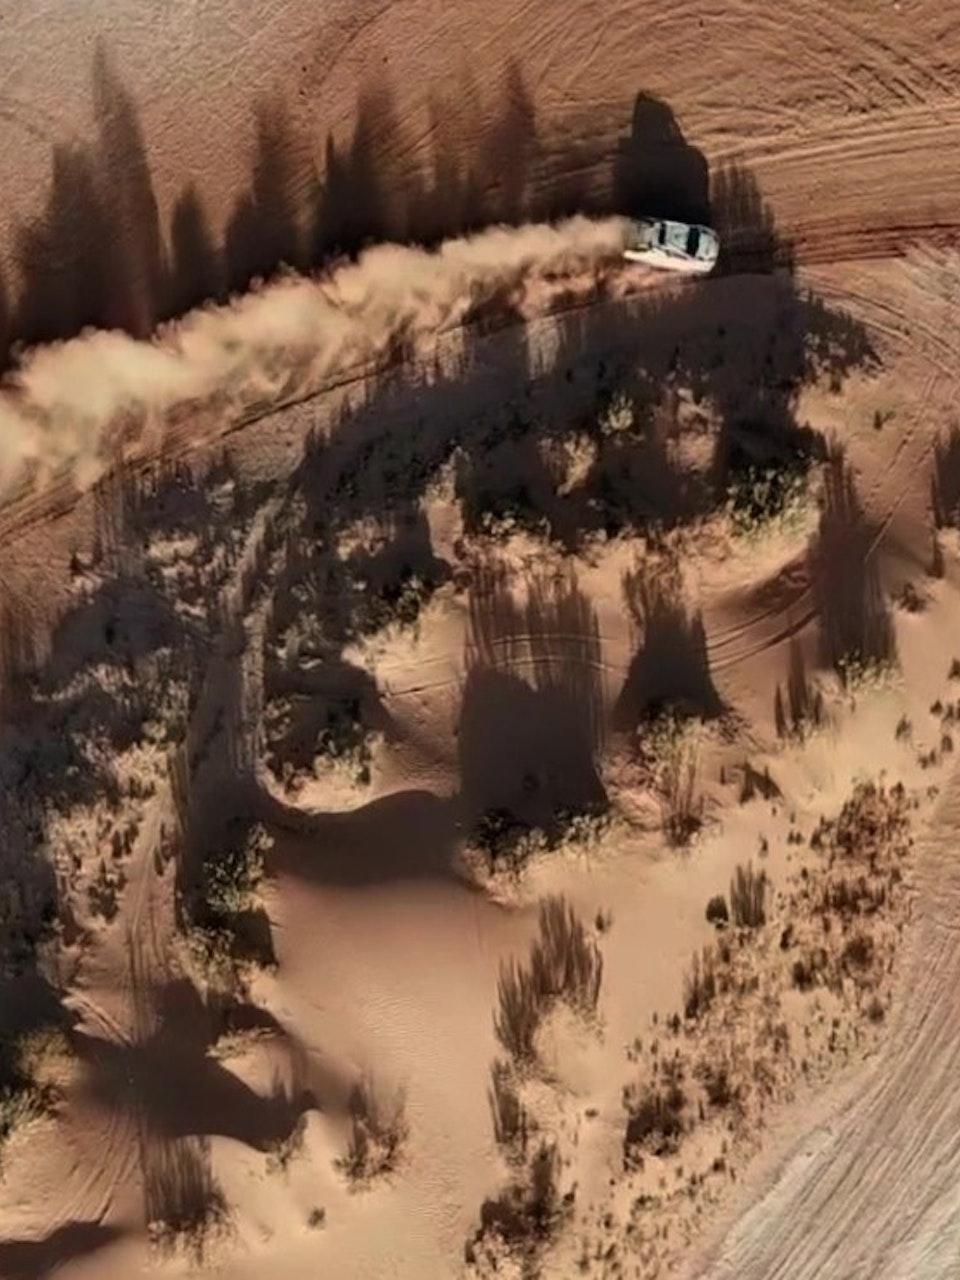 electriclimefilms - Automotive TVC Director Jolyon Watkins 'Art of Filmmaking'